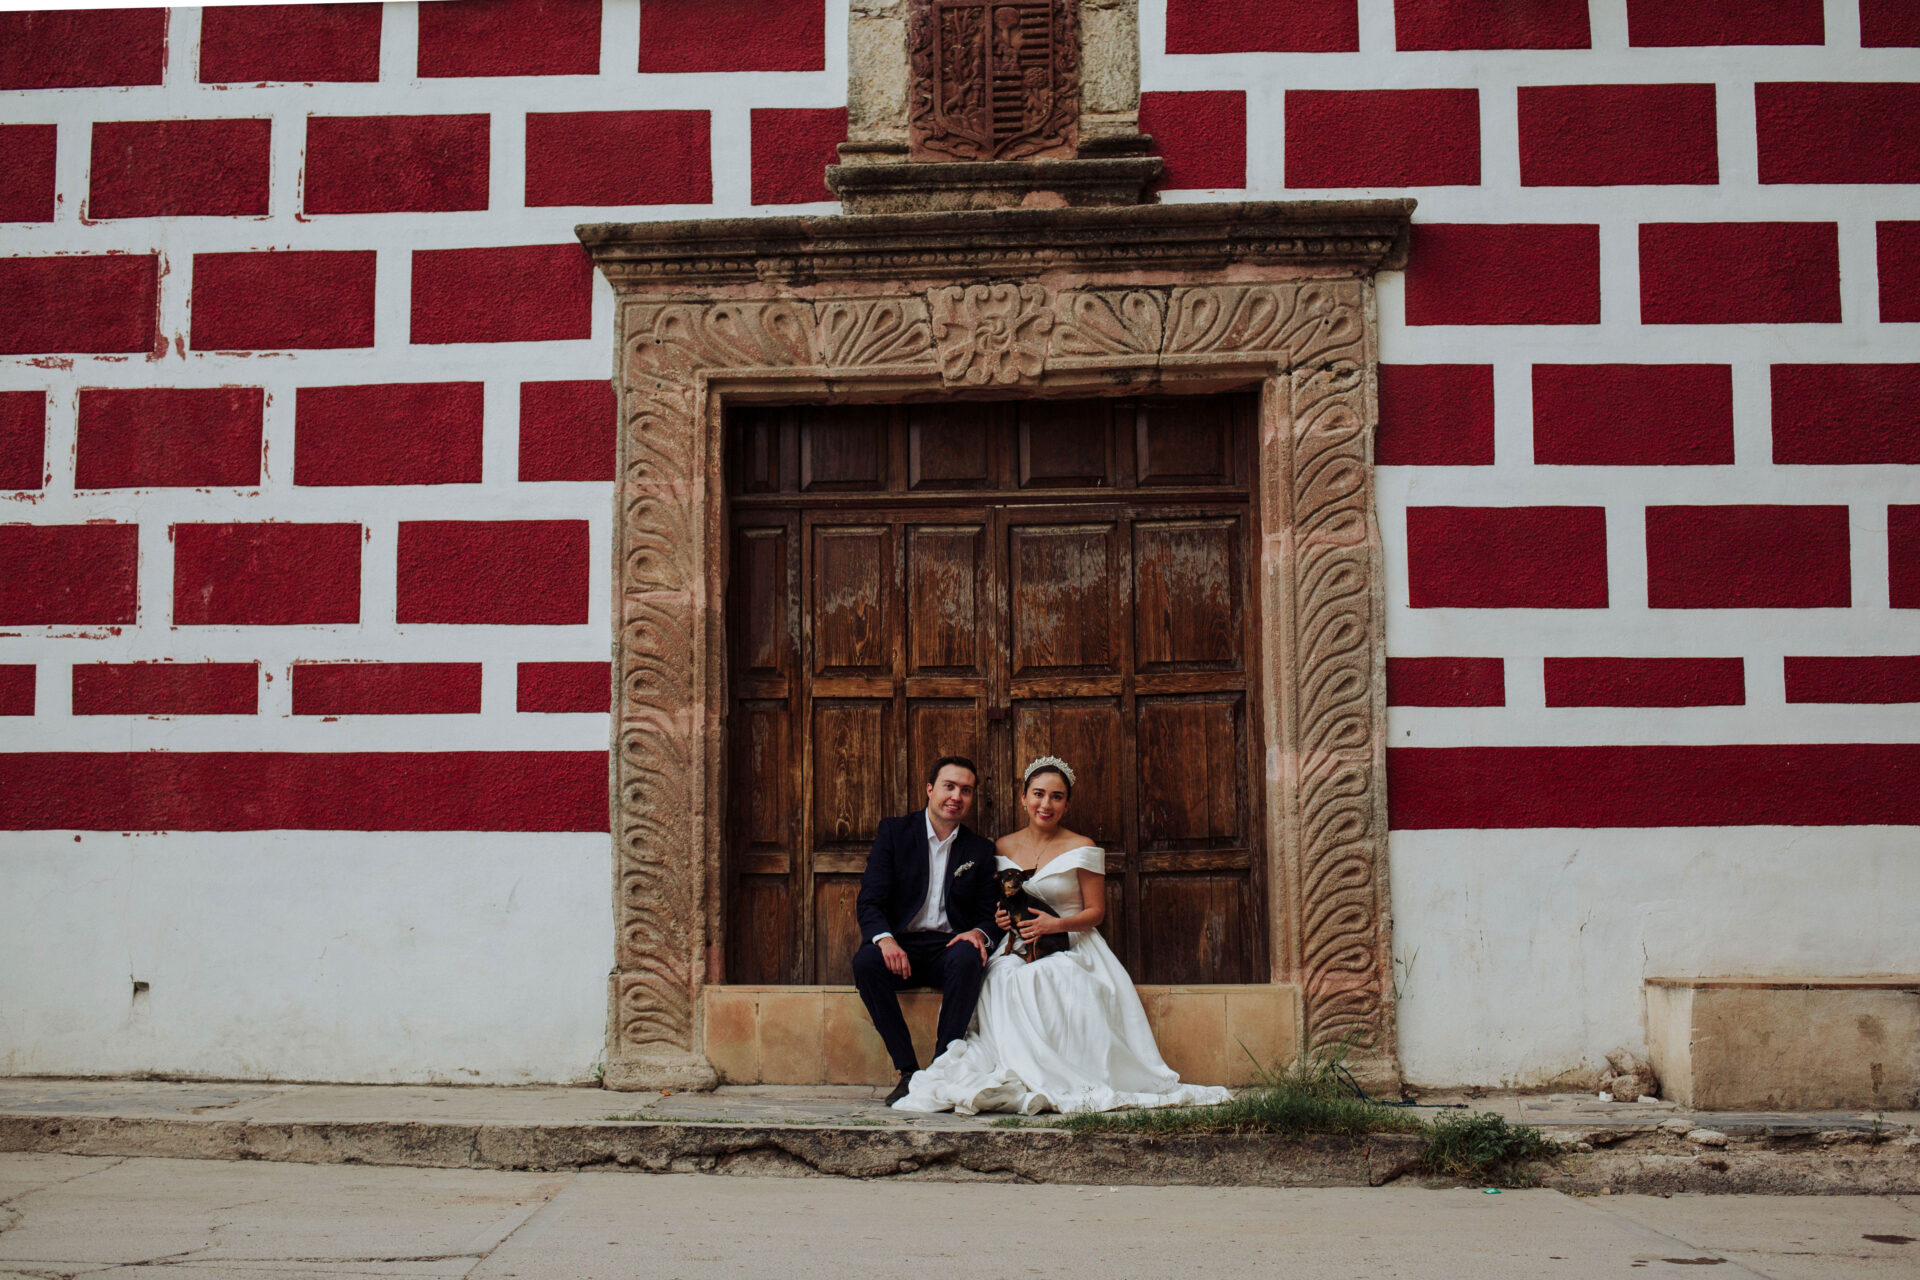 javier_noriega_fotografo_bodas_zacatecas_aguascalientes_asientos00012